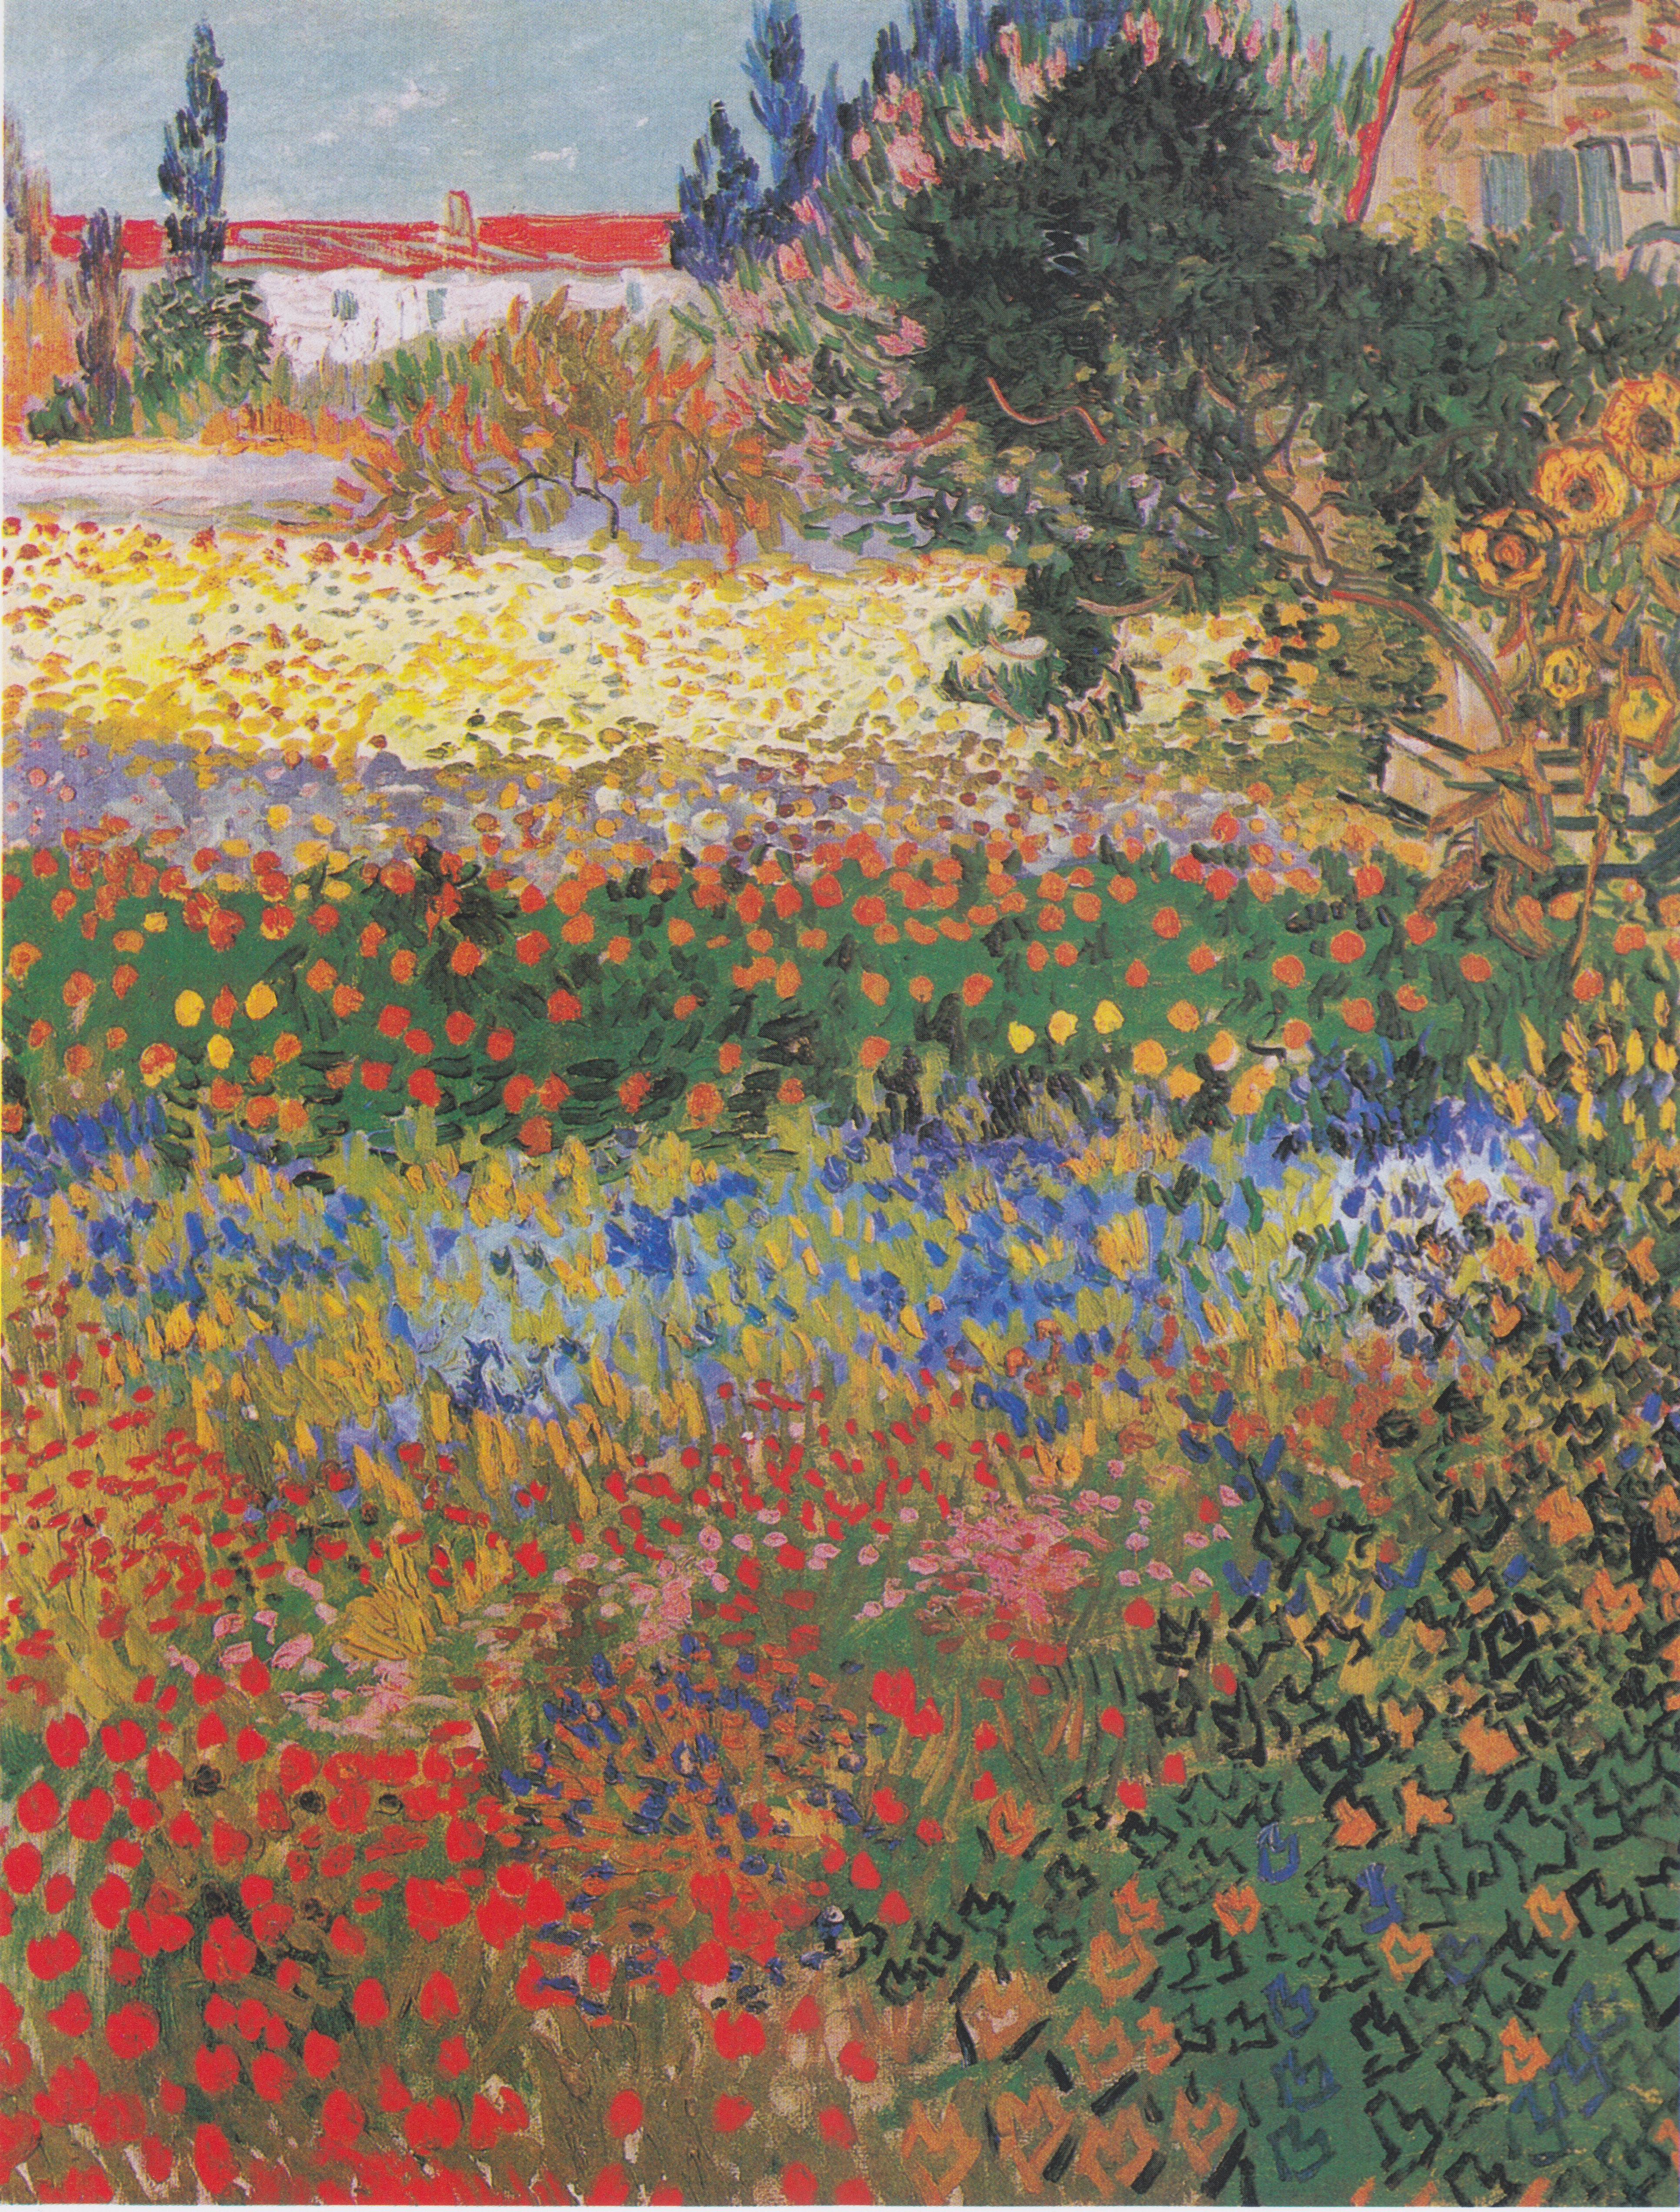 Bilder Blumengarten file gogh blumengarten jpeg wikimedia commons